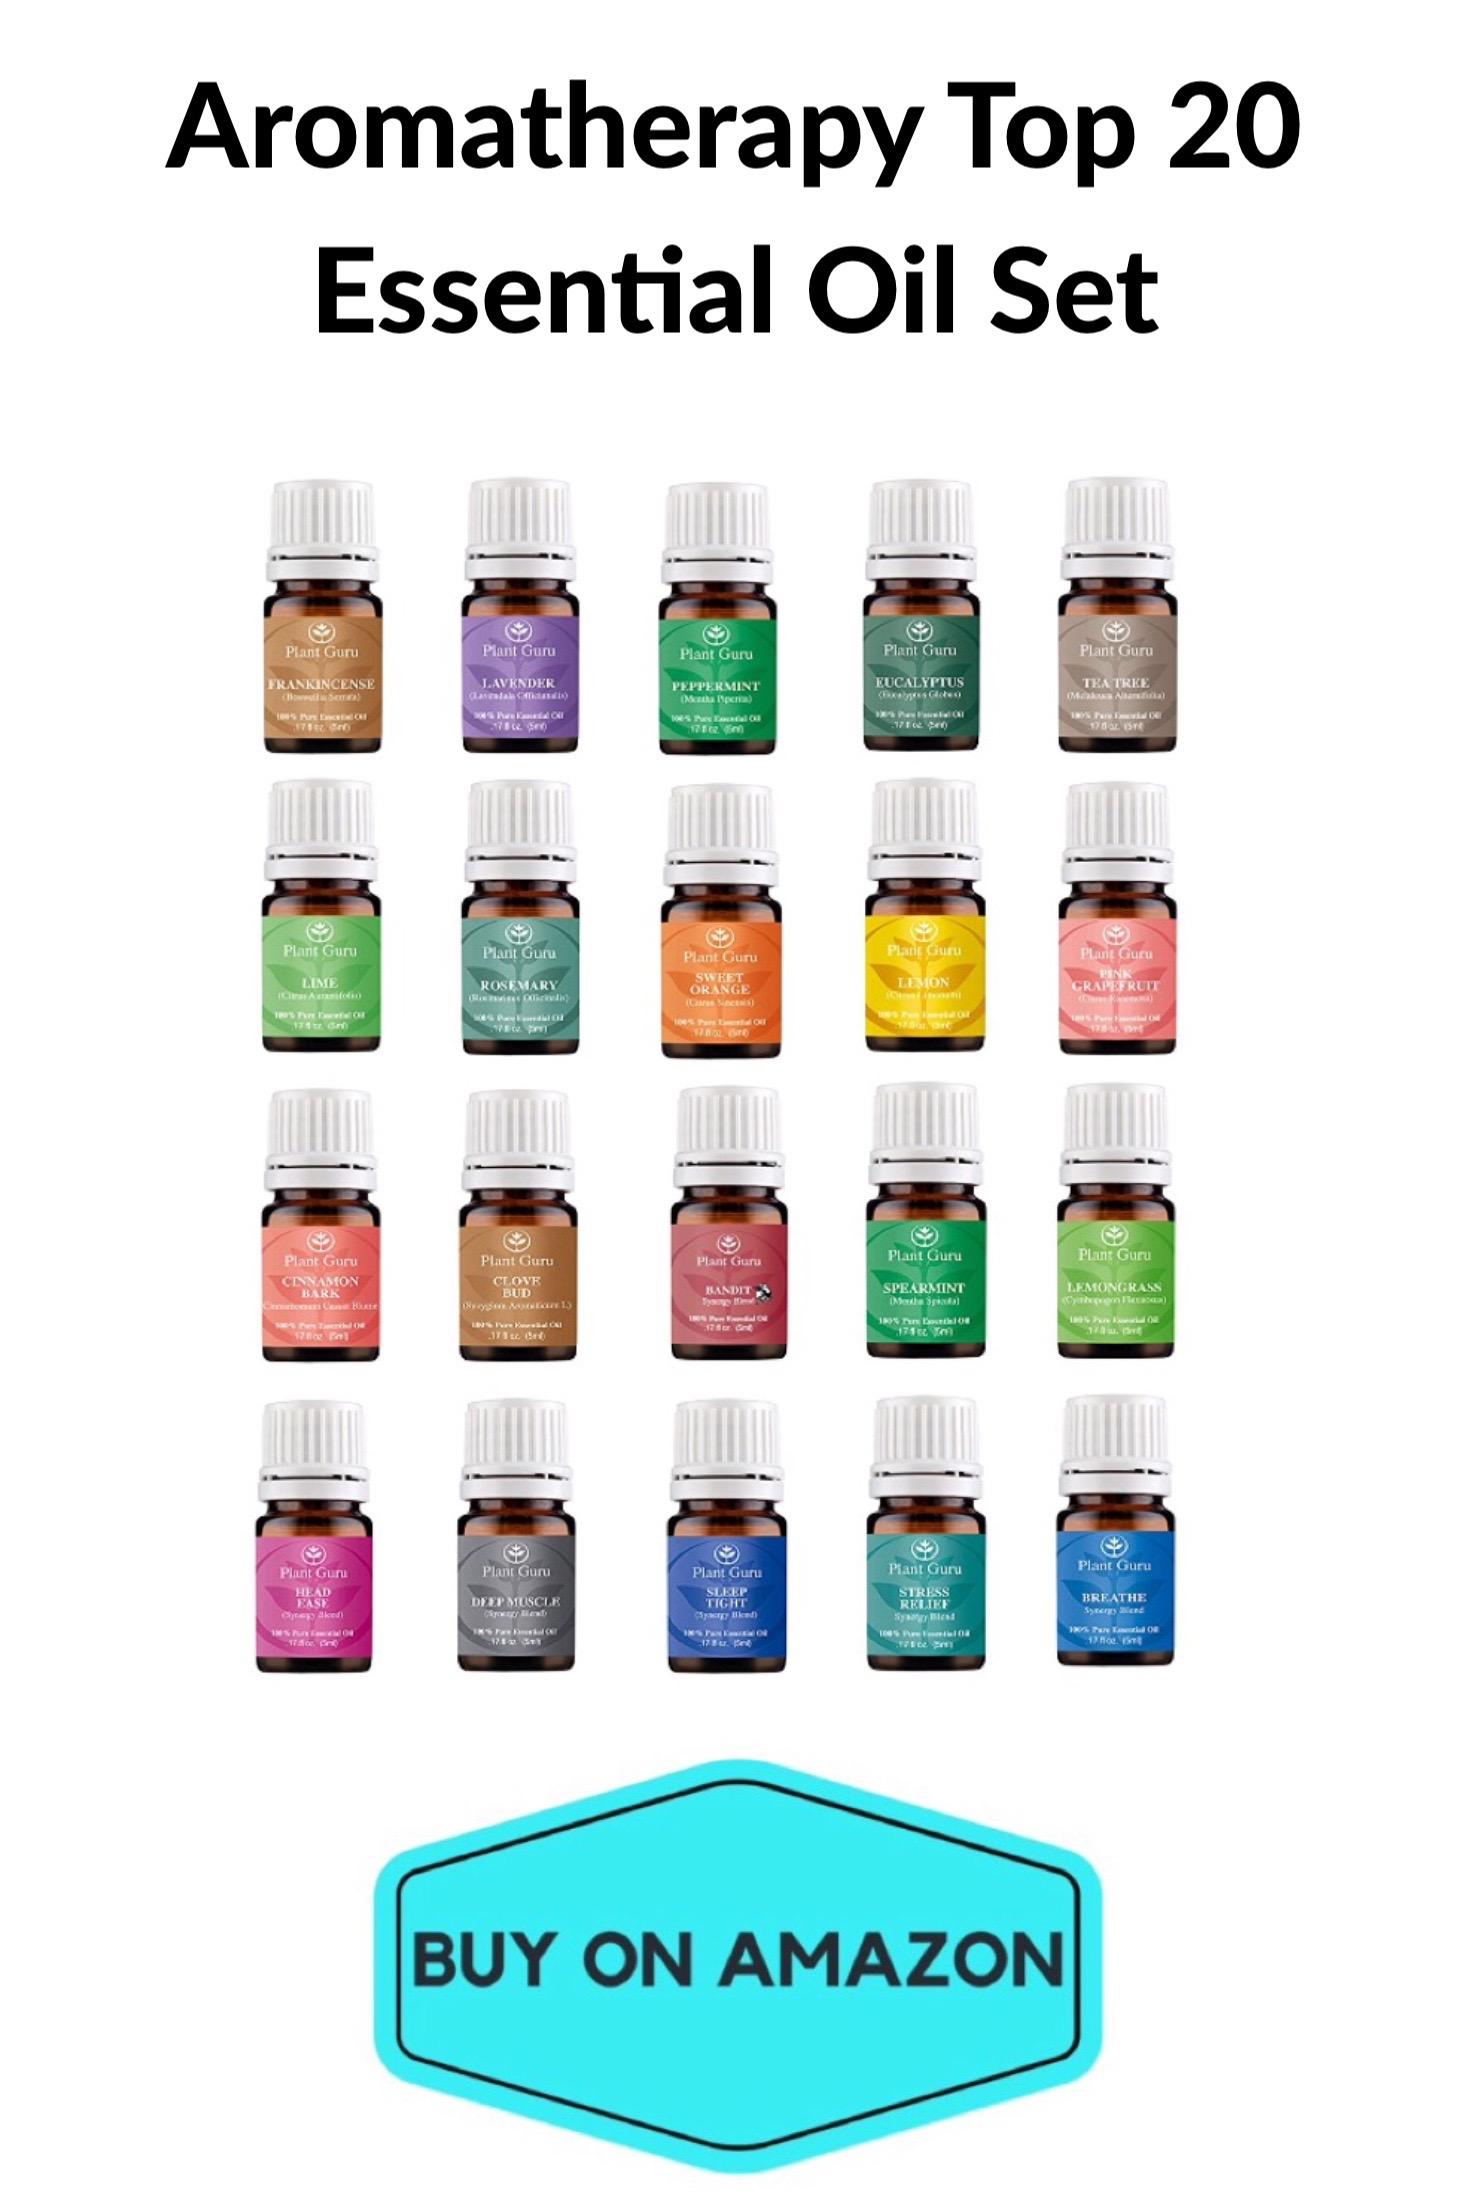 Aromatherapy Top 20 Essential Oil set